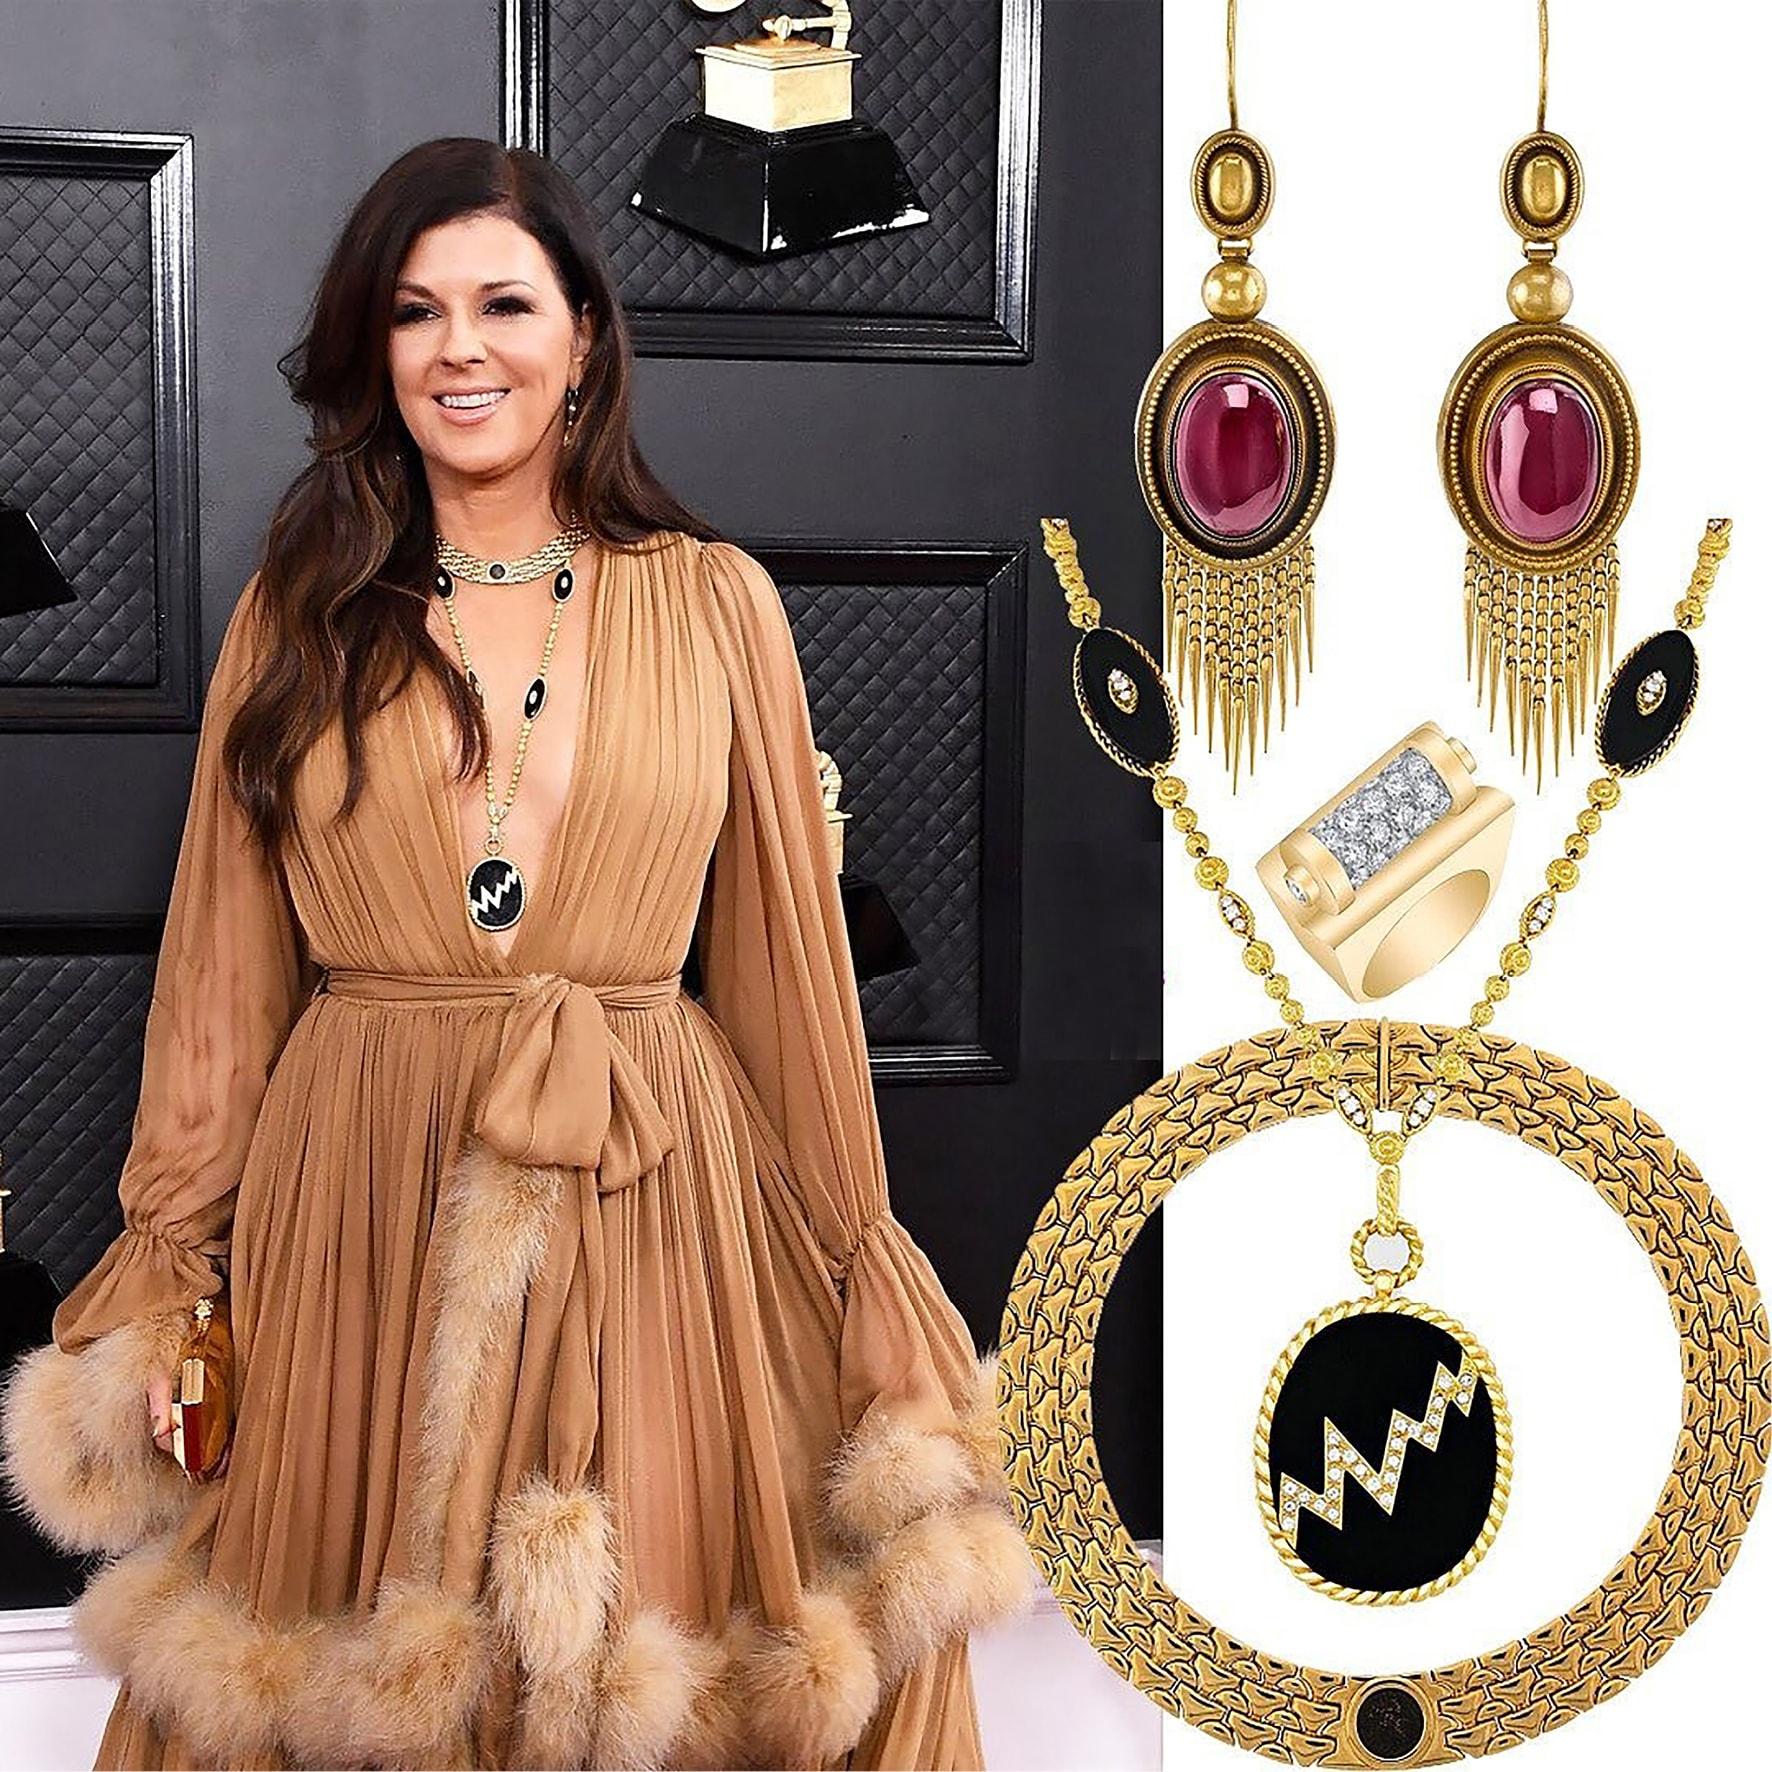 KAREN FAIRCHILD wearing garnet and gold fringe earrings and a diamond and gold retro ring